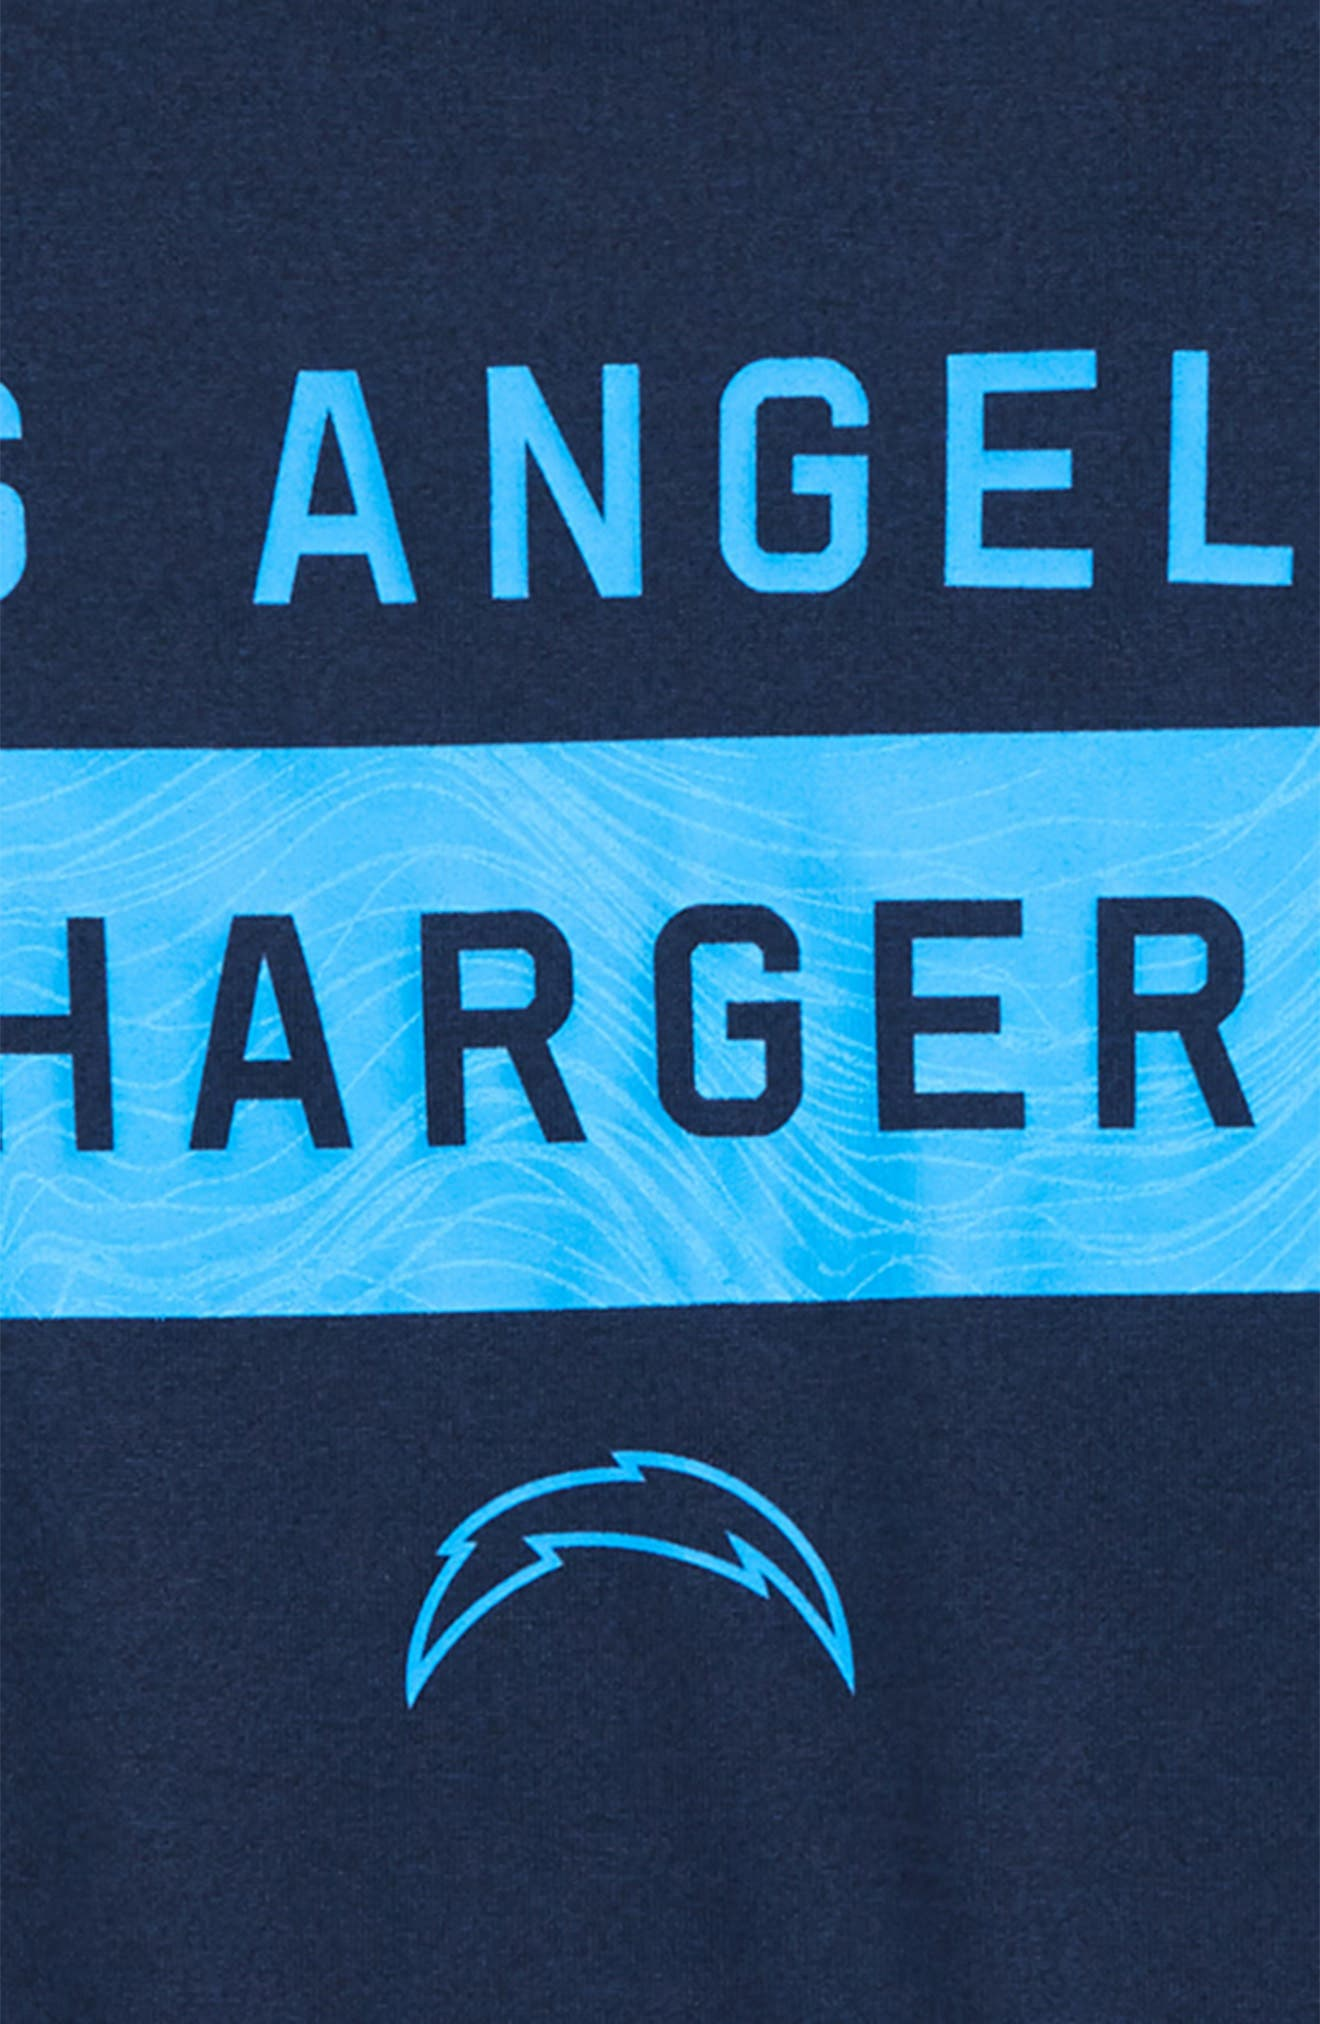 NFL Los Angeles Chargers Dry Legend Lift T-Shirt,                             Alternate thumbnail 2, color,                             NAVY